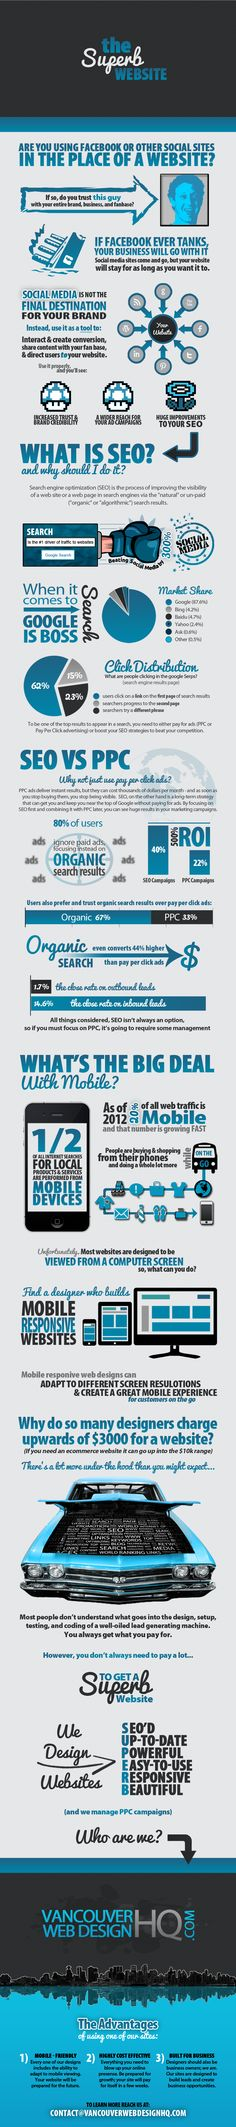 Superb Web Design infographic